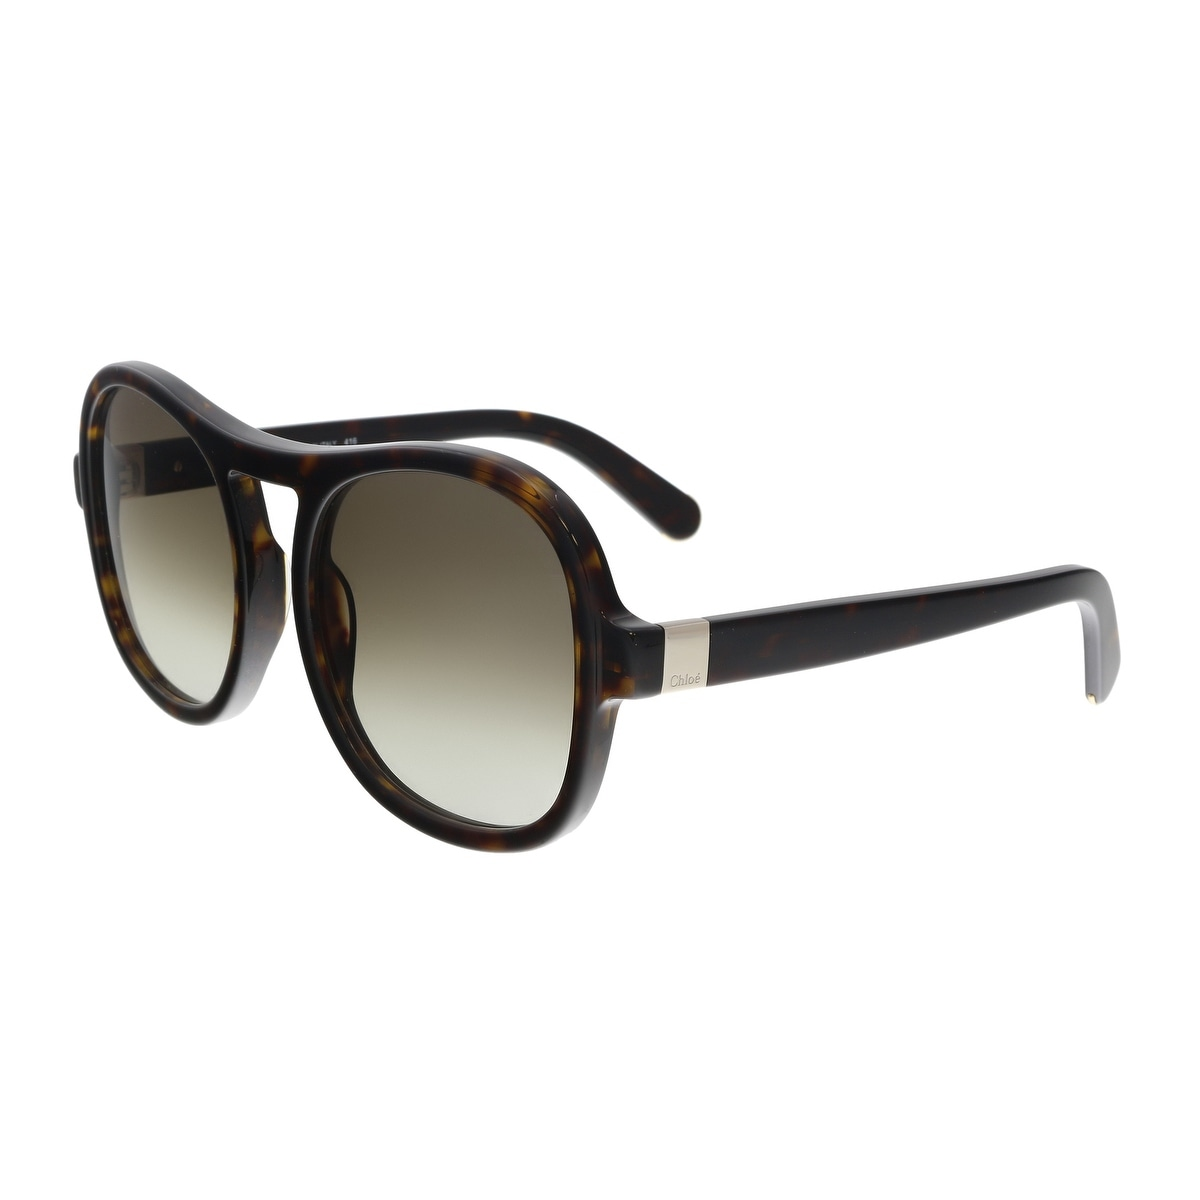 87b7e503e4c Chloe Sunglasses